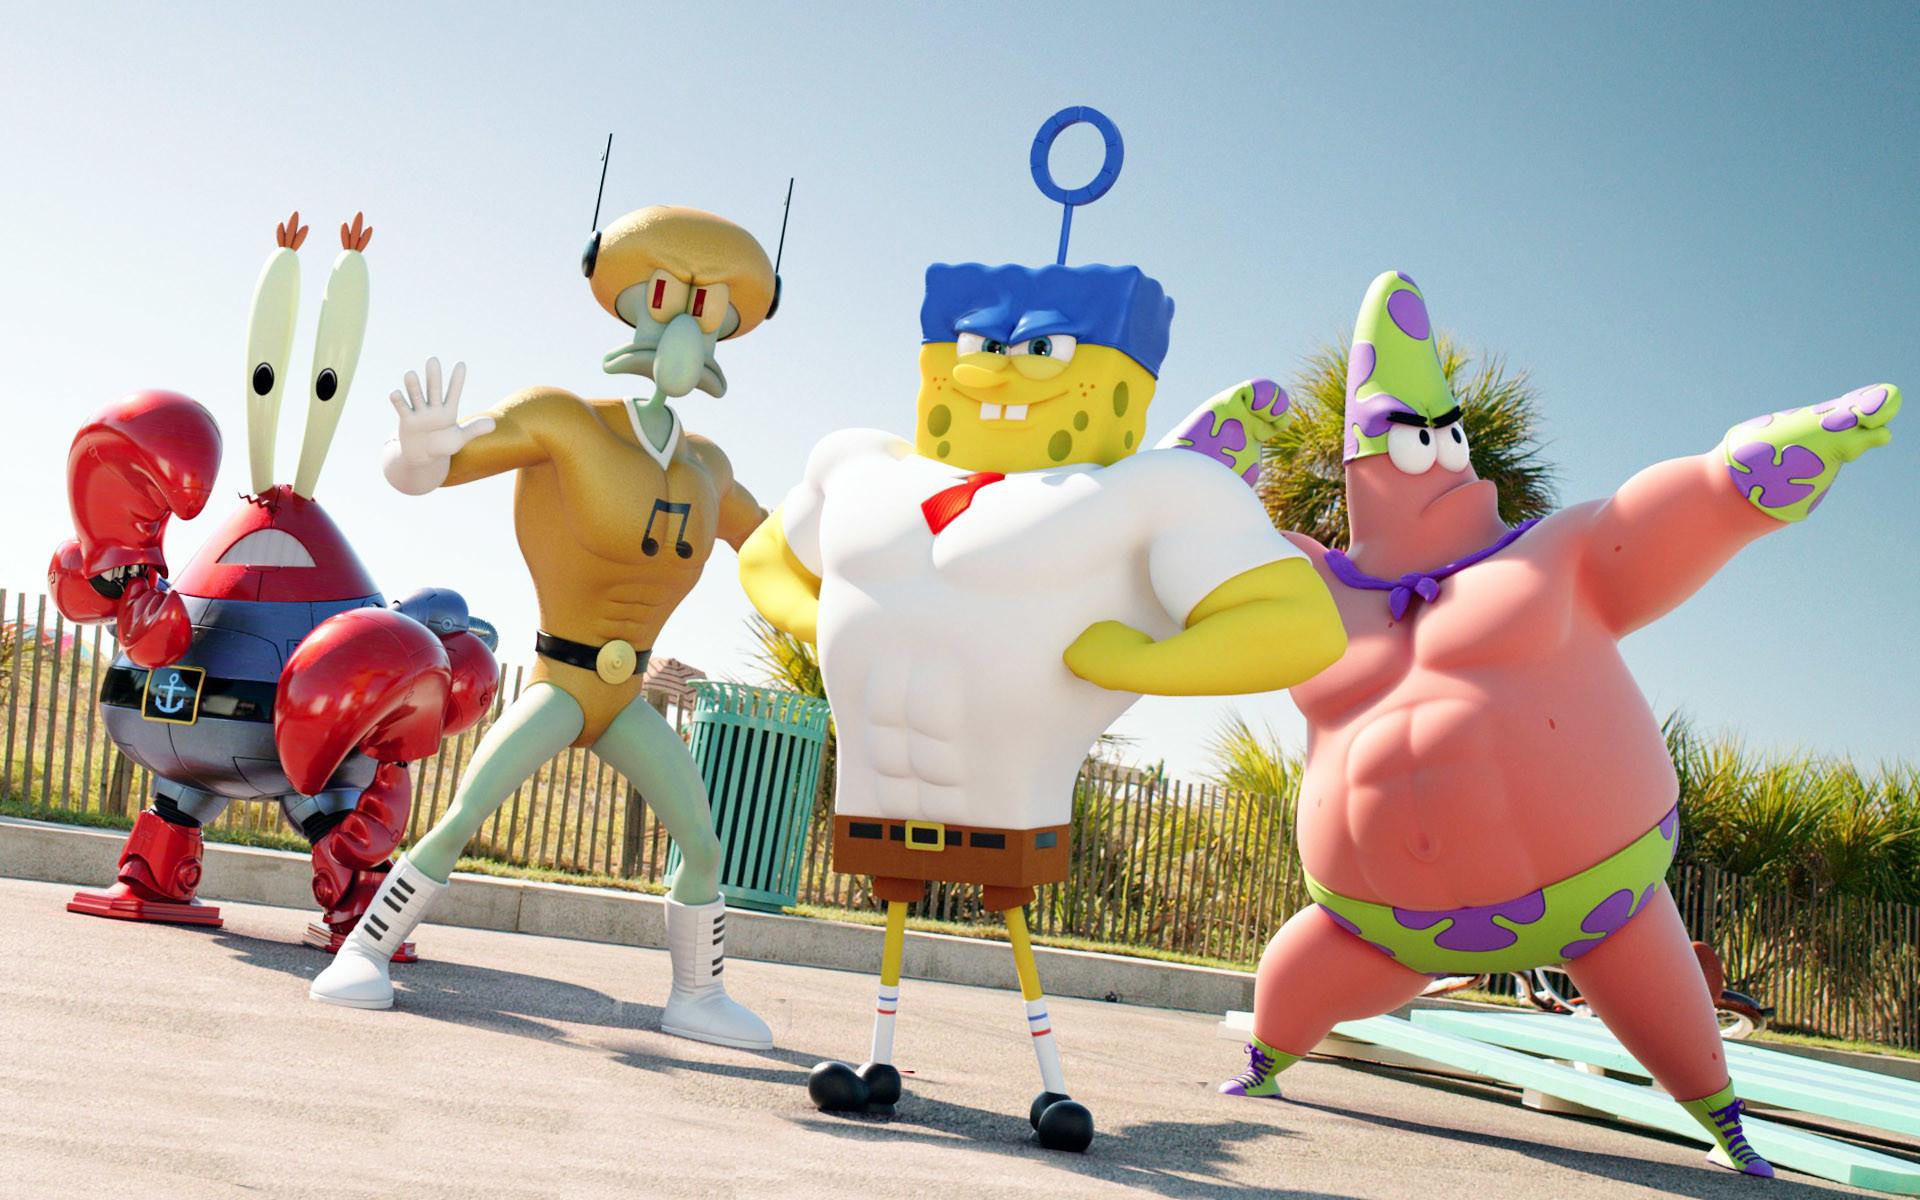 Res: 1920x1200, Spongebob and his friends